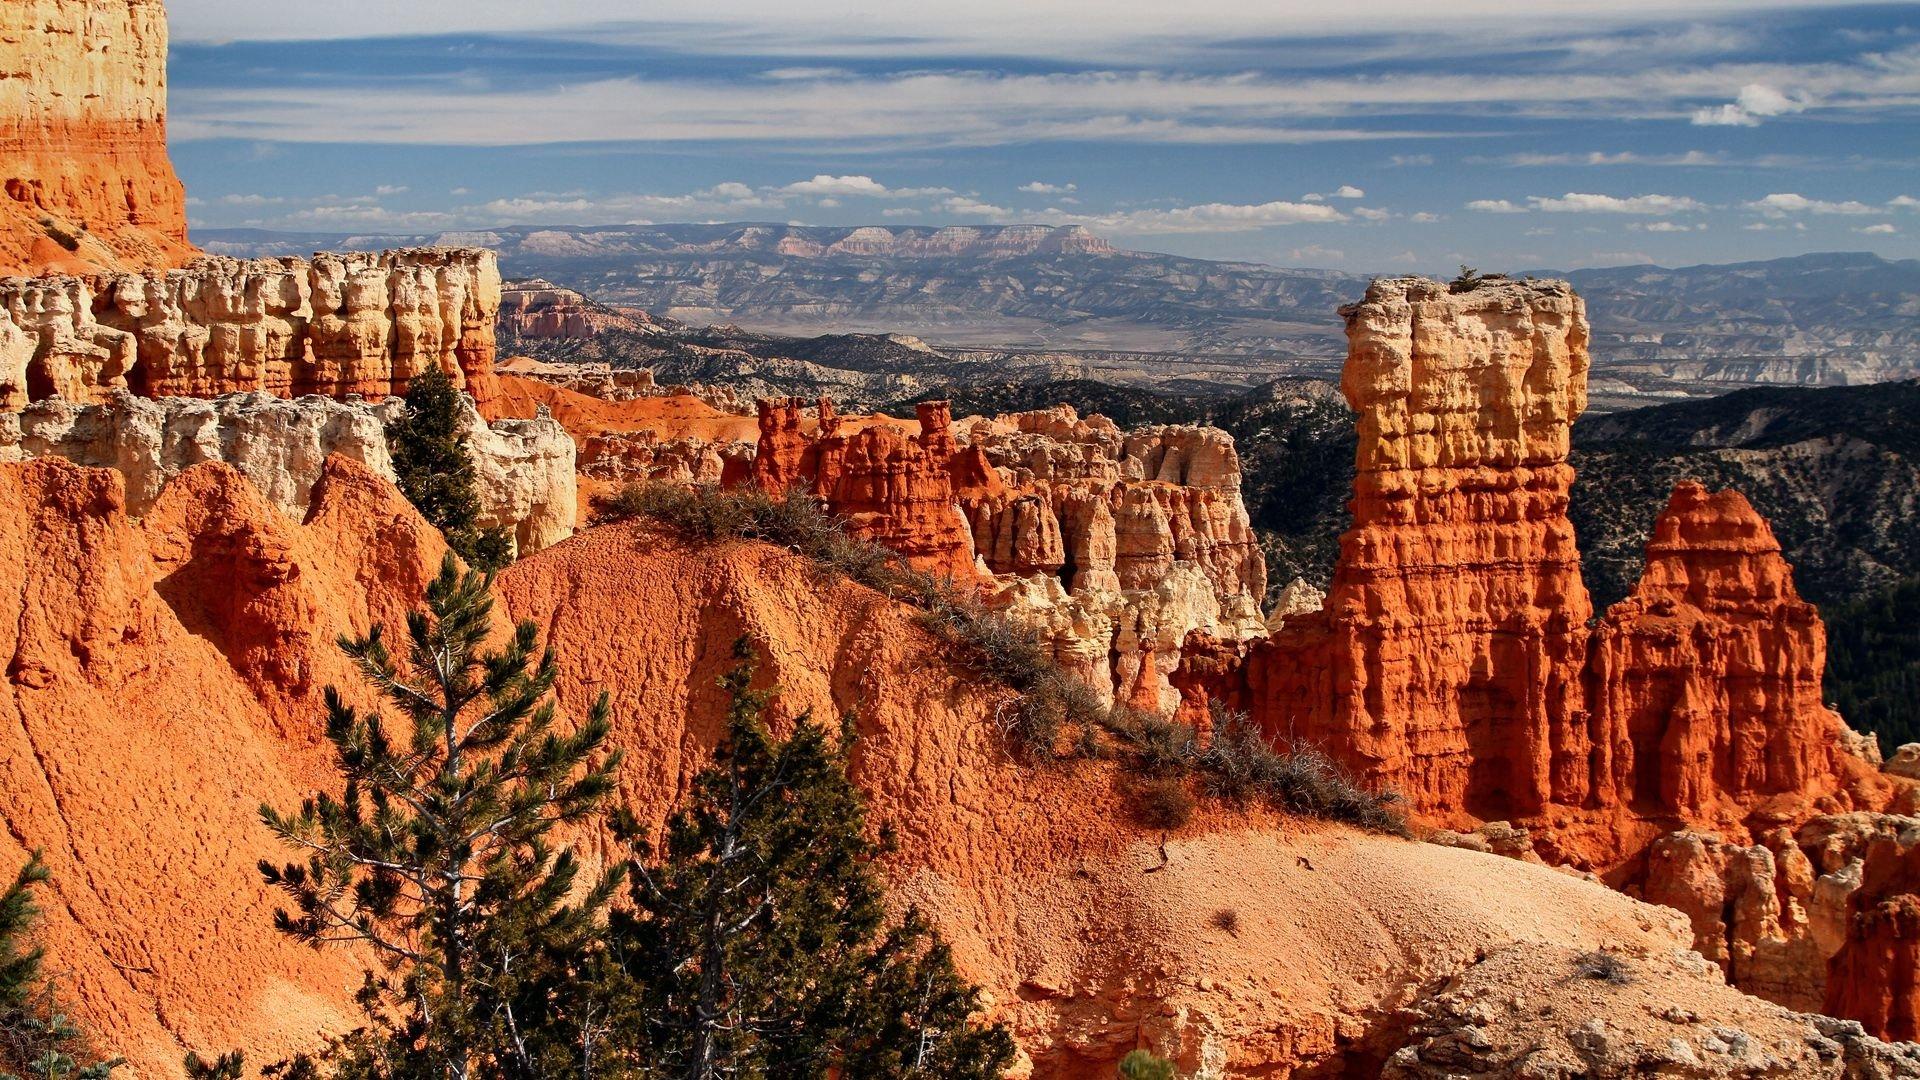 Bryce Canyon USA HD Wallpaper Background Image 1920x1080 ID 1920x1080